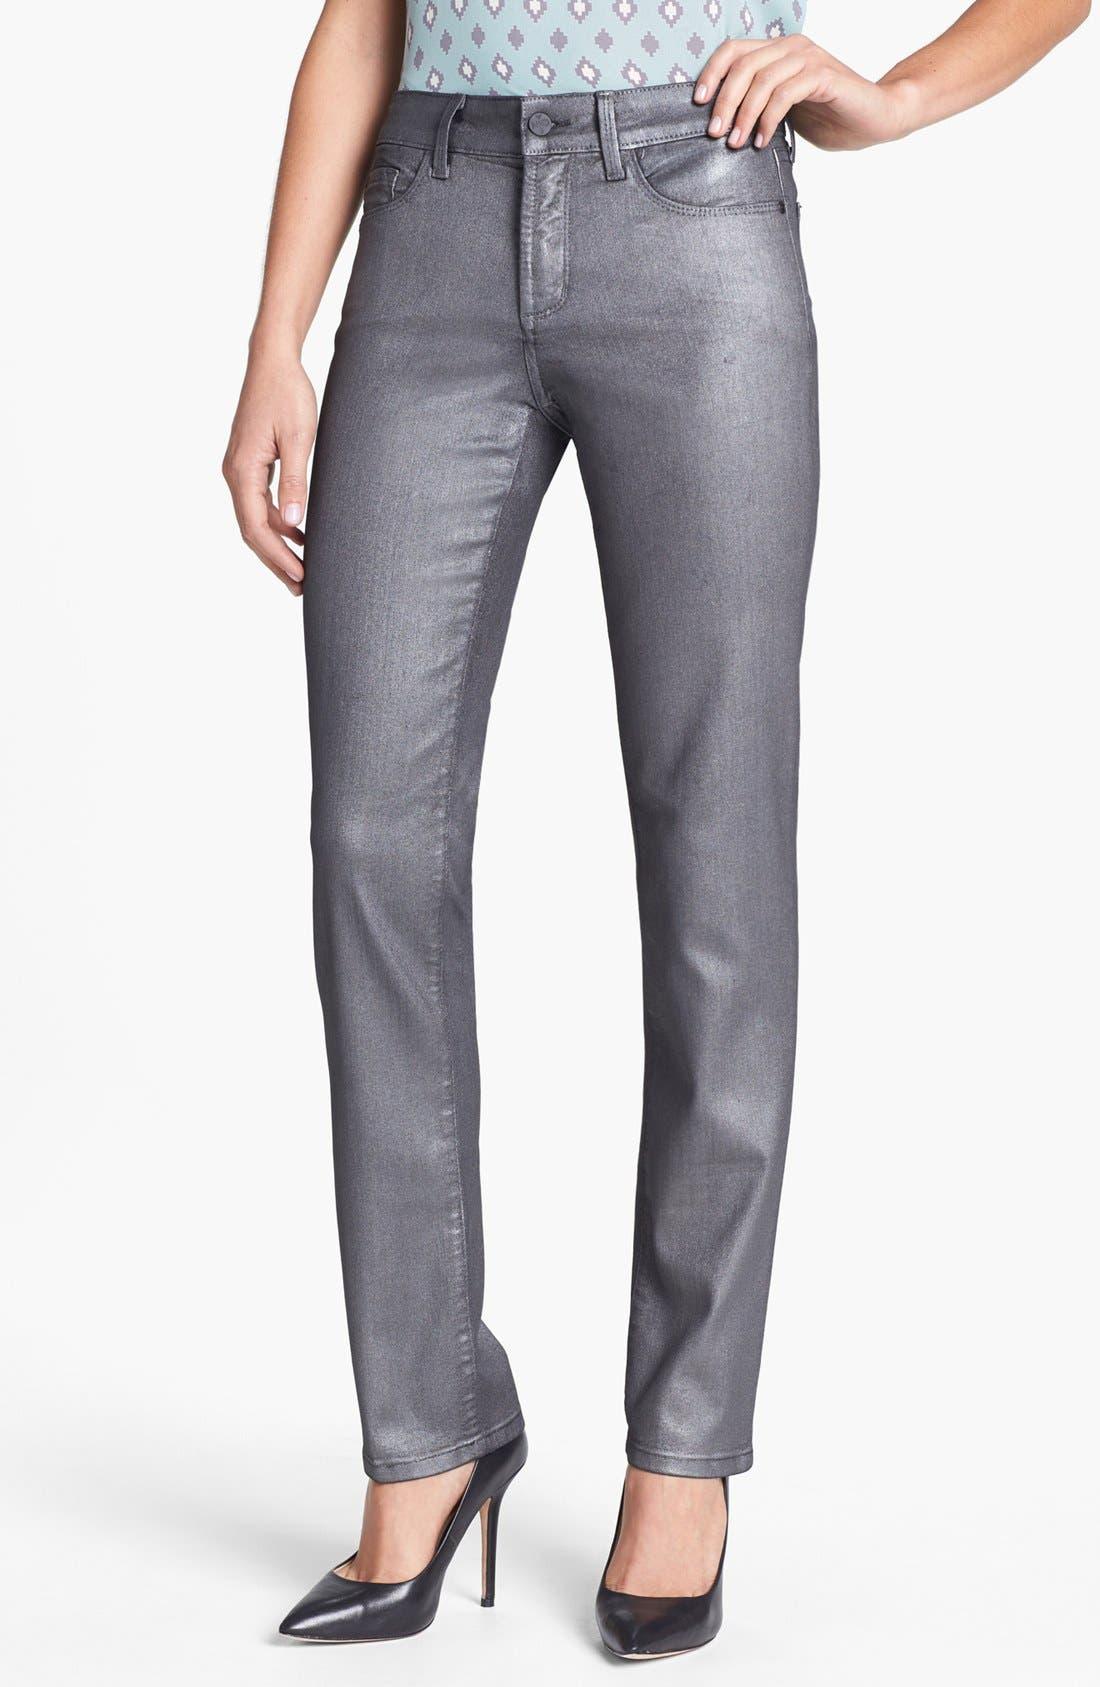 Alternate Image 1 Selected - NYDJ 'Sheri' Foiled Stretch Skinny Jeans